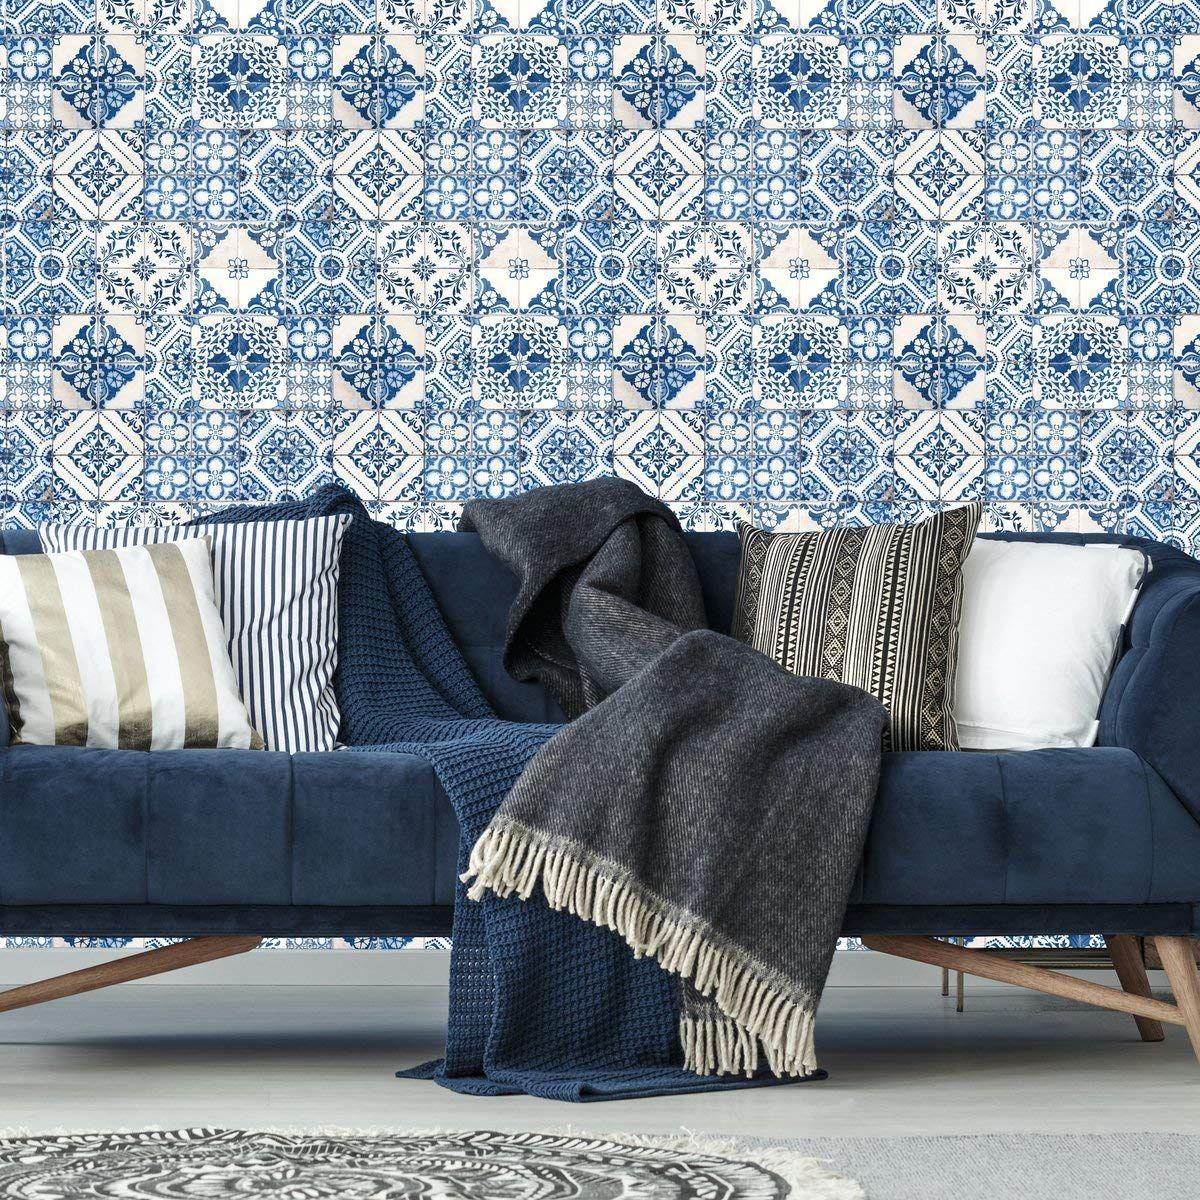 Roommates Mediterranian Tile Peel And Stick Wallpaper Amazon Com Peel And Stick Wallpaper Blue Mosaic Tile Stick On Tiles